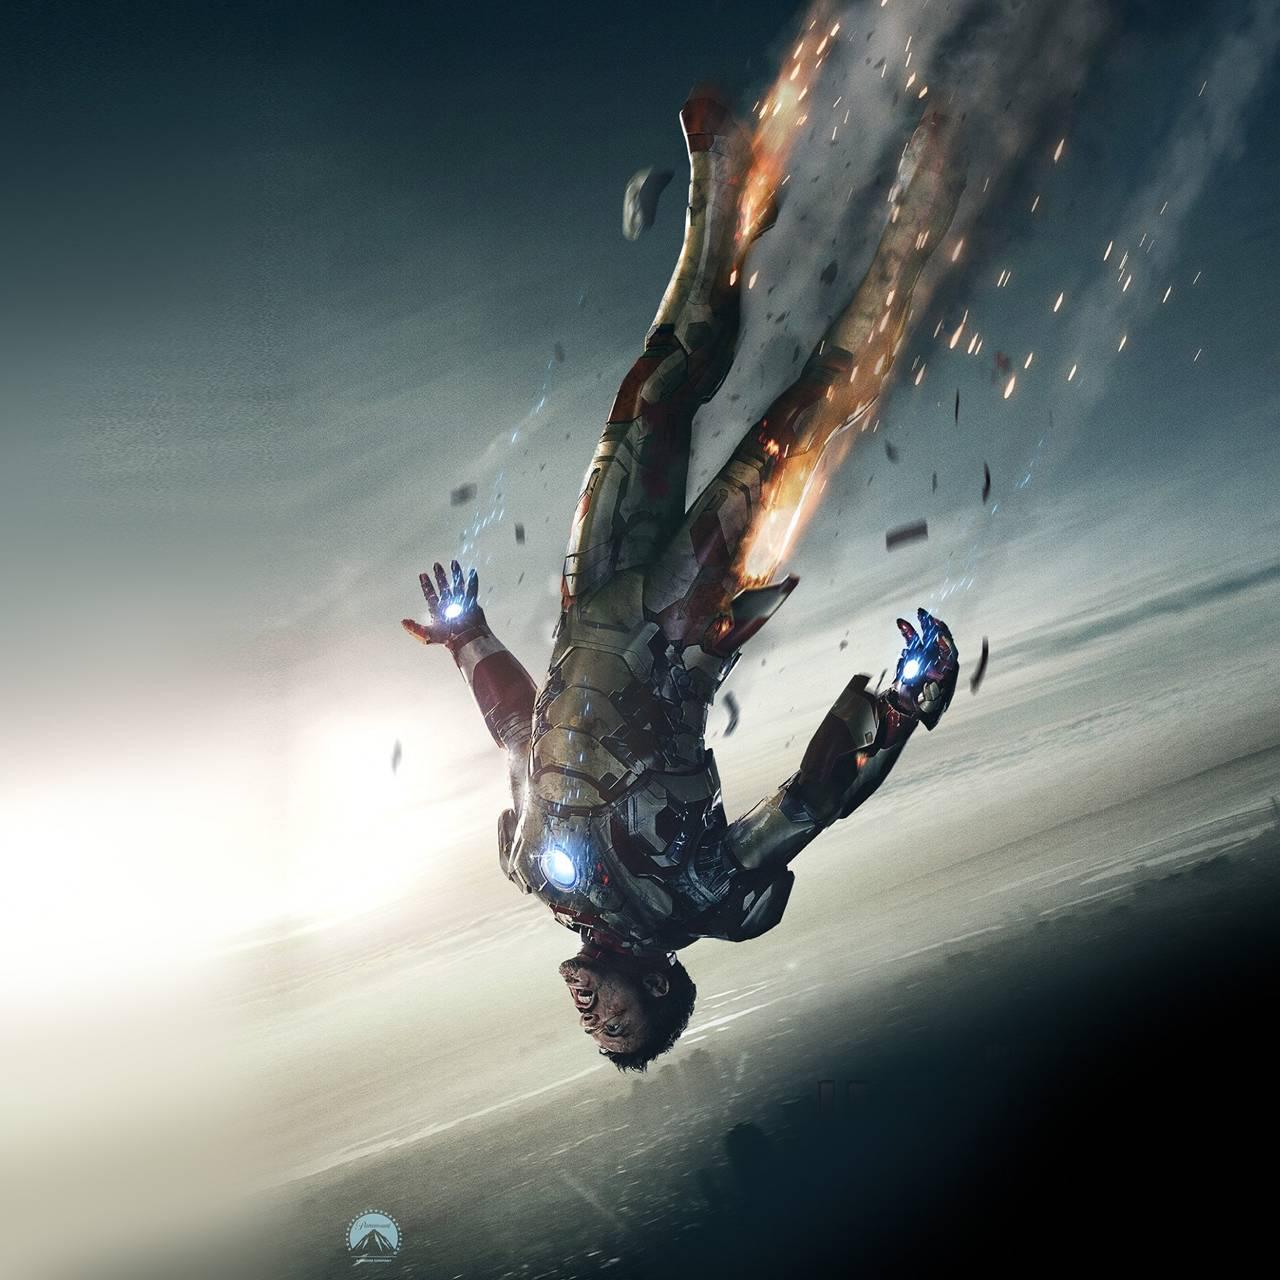 ironman 3 falling